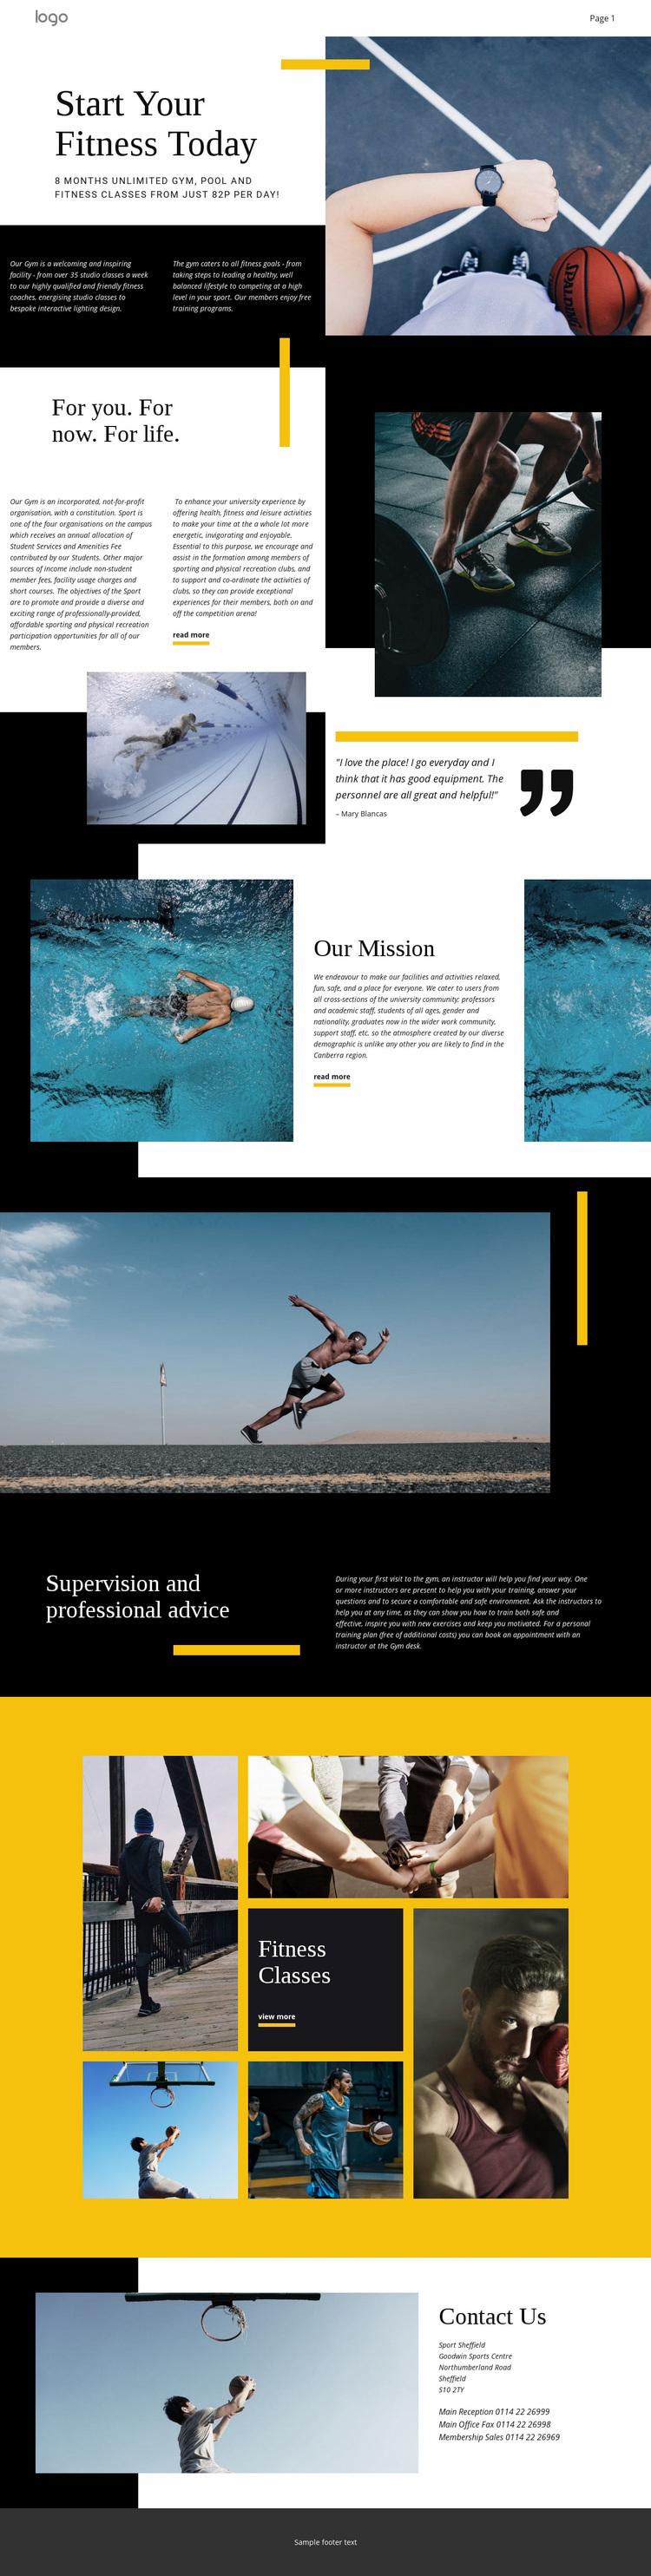 Professional fitness Web Page Designer